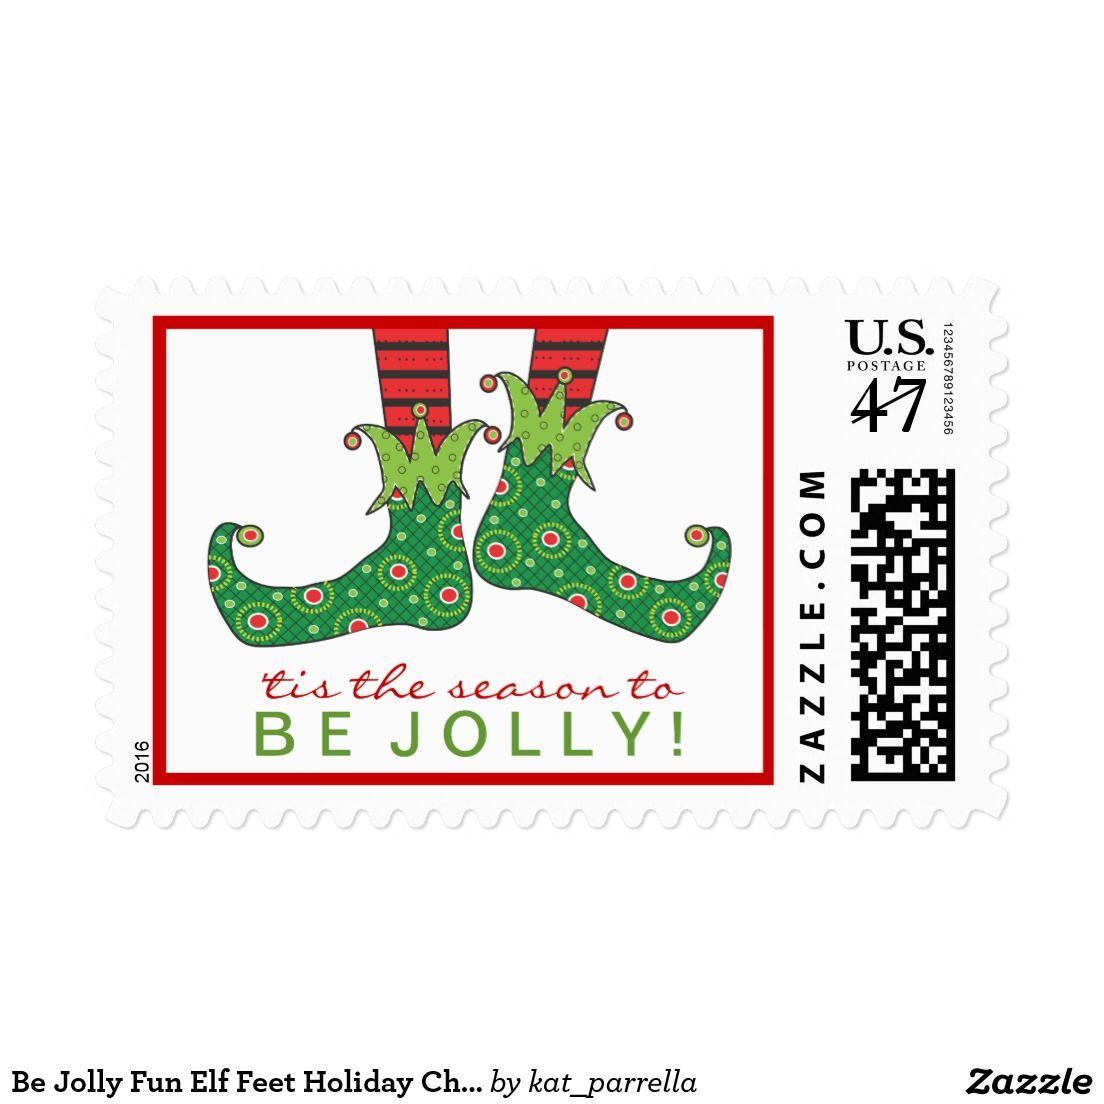 Be Jolly Fun Elf Feet Holiday Christmas custom Postage Stamps.